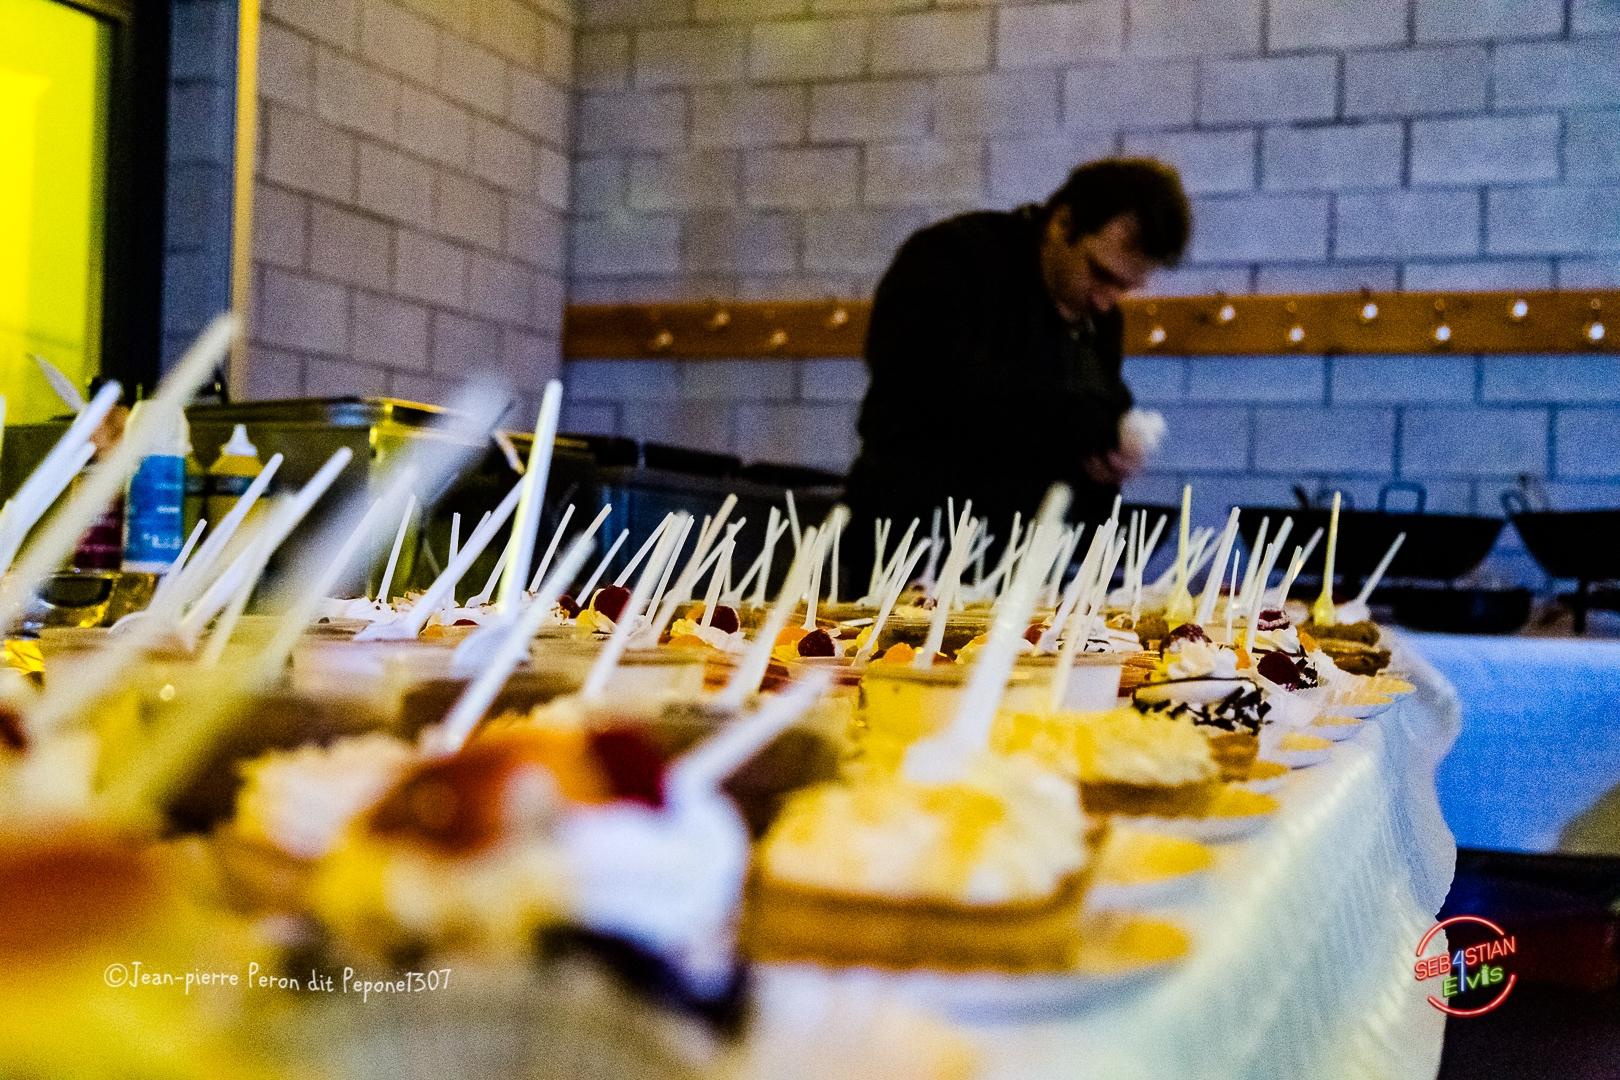 sebastian-for-elvis-pepone1307-centre-culturel-rocourt-facebook-504